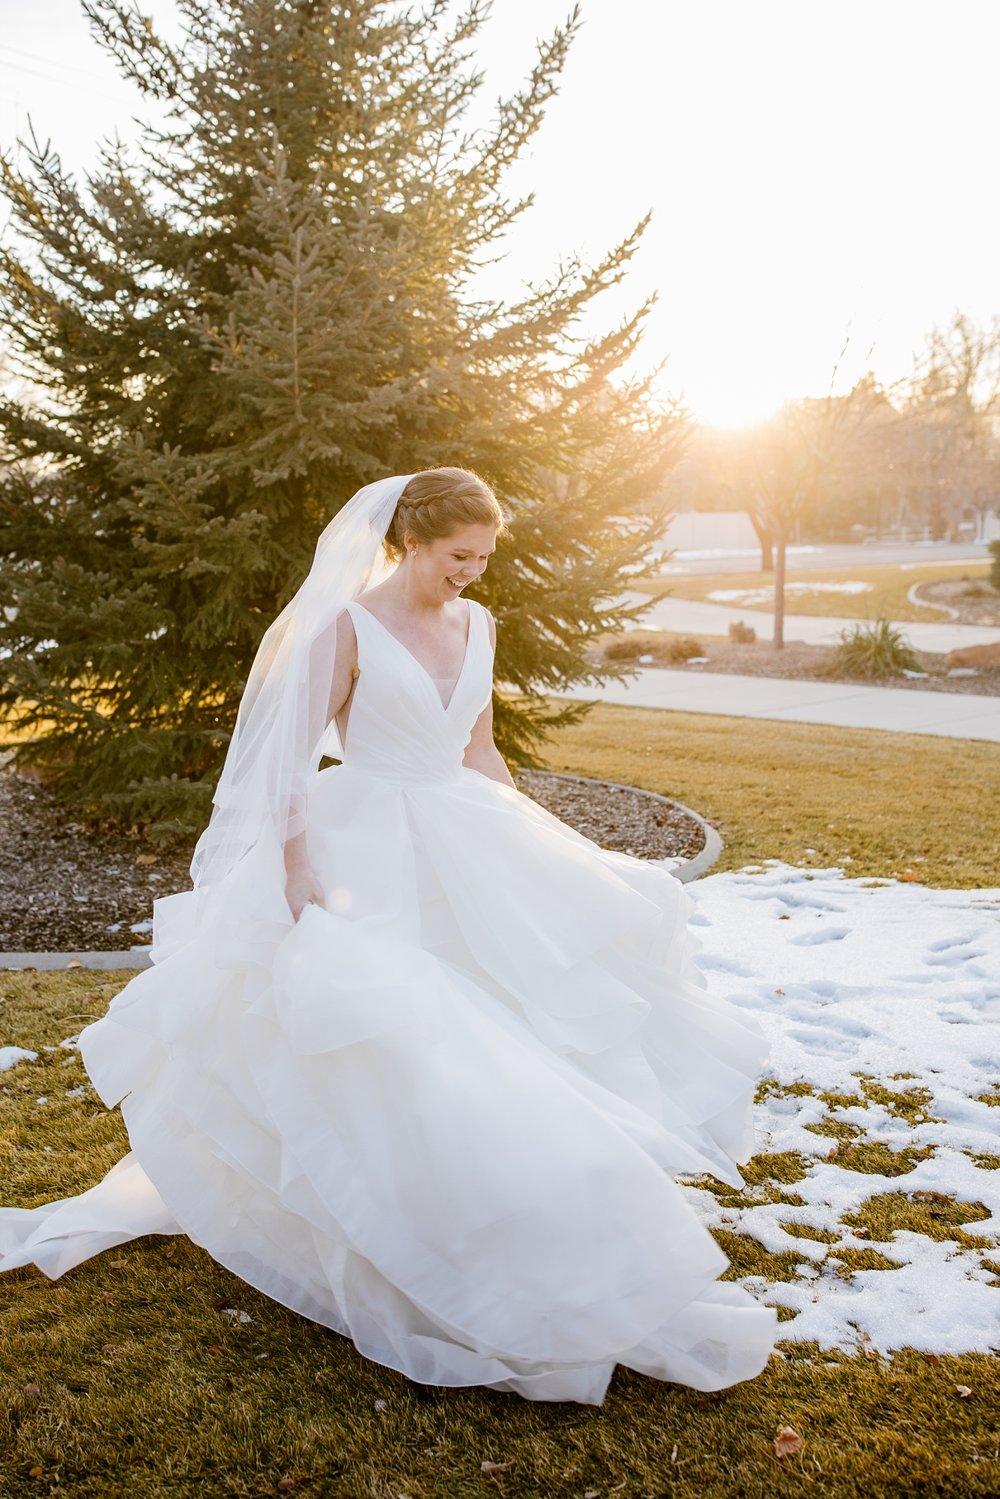 CN-Wedding-260_Lizzie-B-Imagery-Utah-Wedding-Photographer-Blessed-Sacrament-Catholic-Church-Sandy-Utah-The-Blended-Table-Salt-Lake-City.jpg